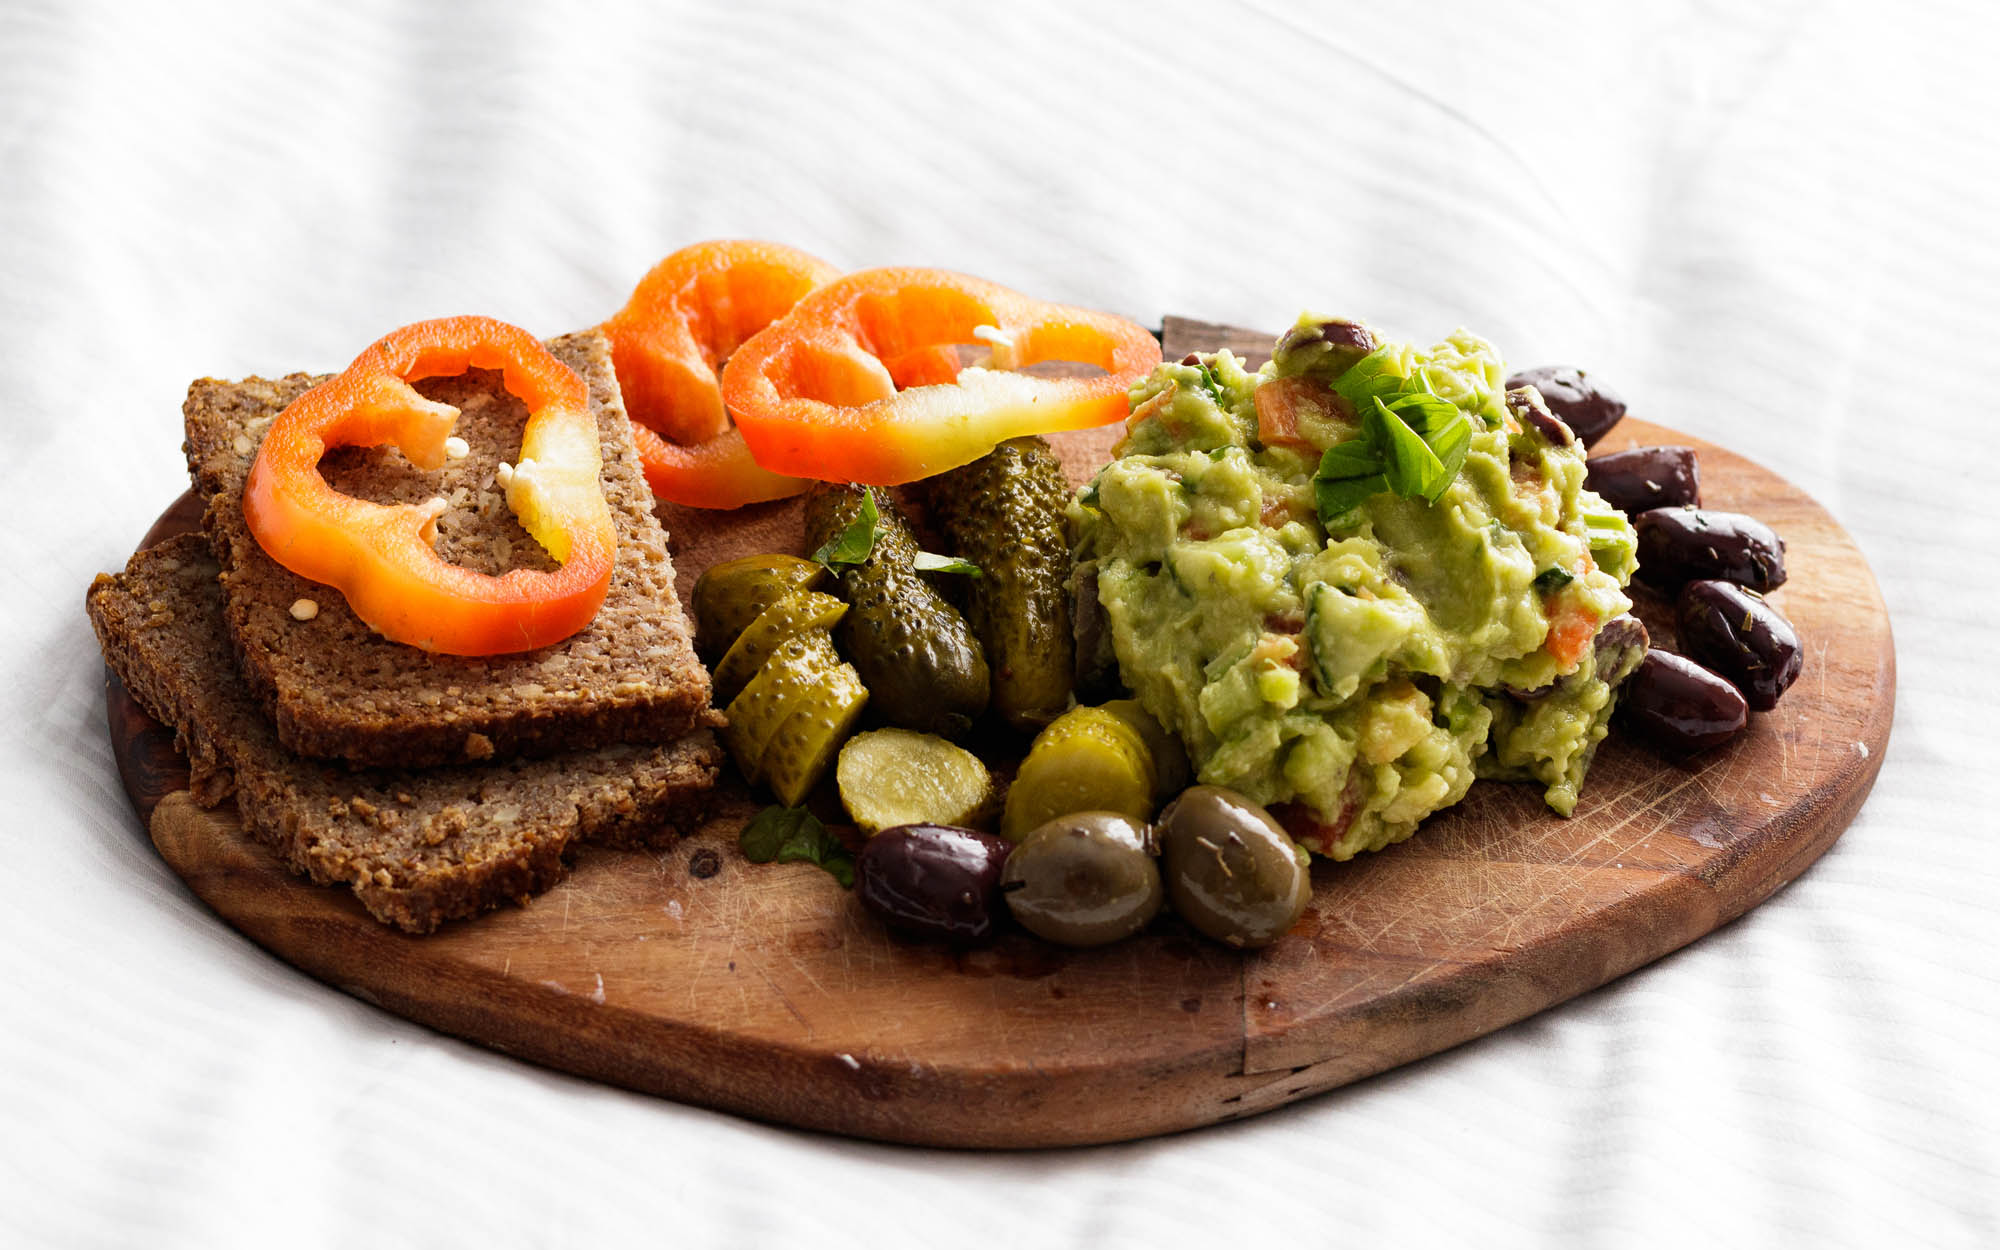 Simply Delicious 5-Minute Vegan Plateau